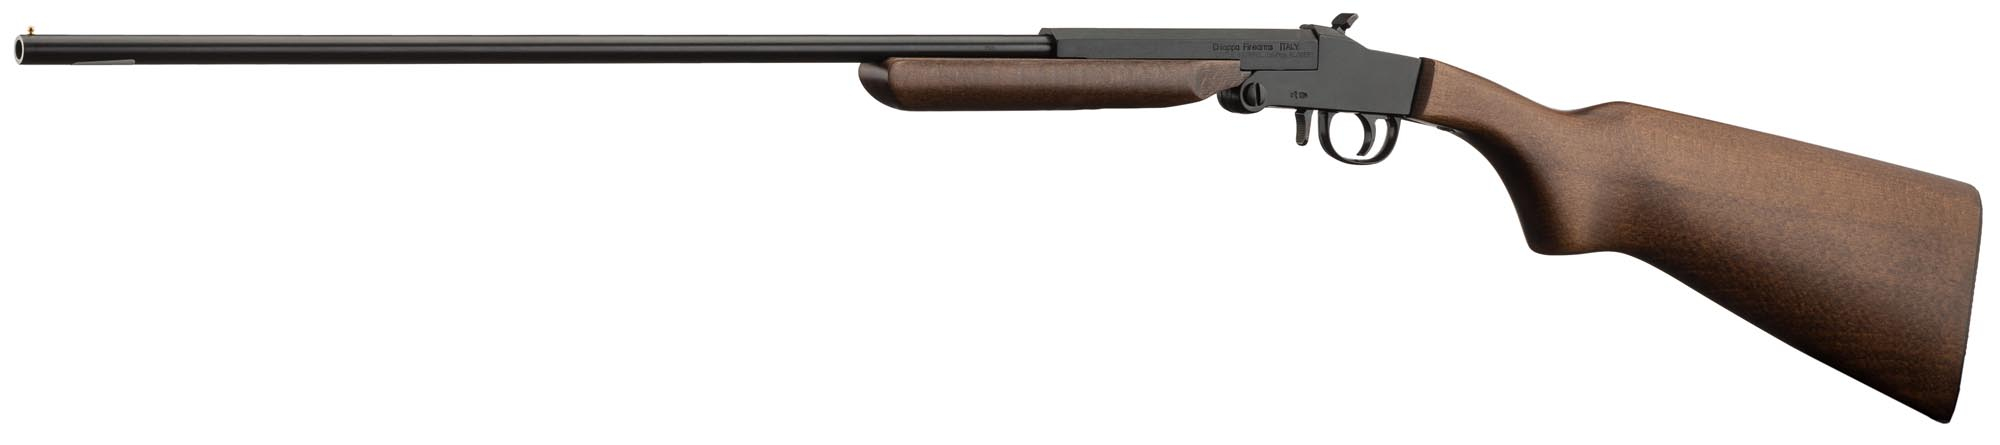 CJ520-2